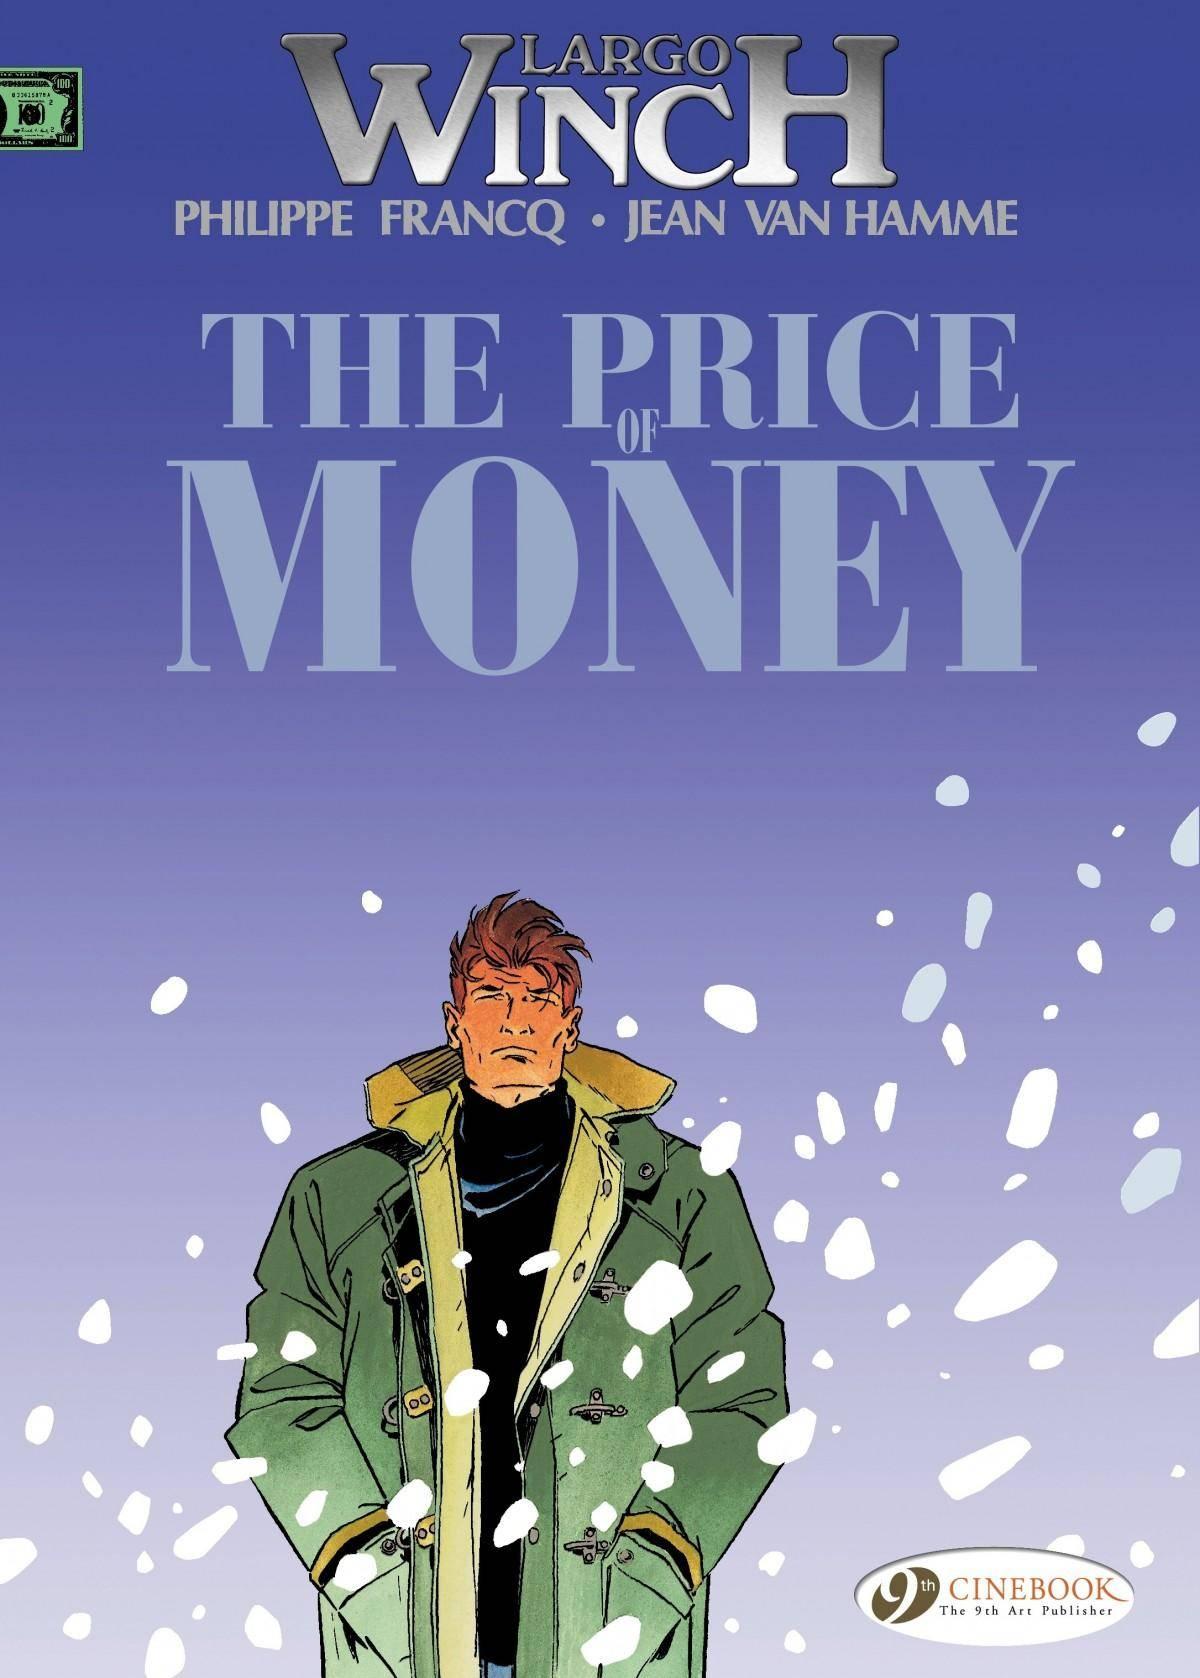 Largo Winch 009 - The Price of Money 2012 Cinebook digital